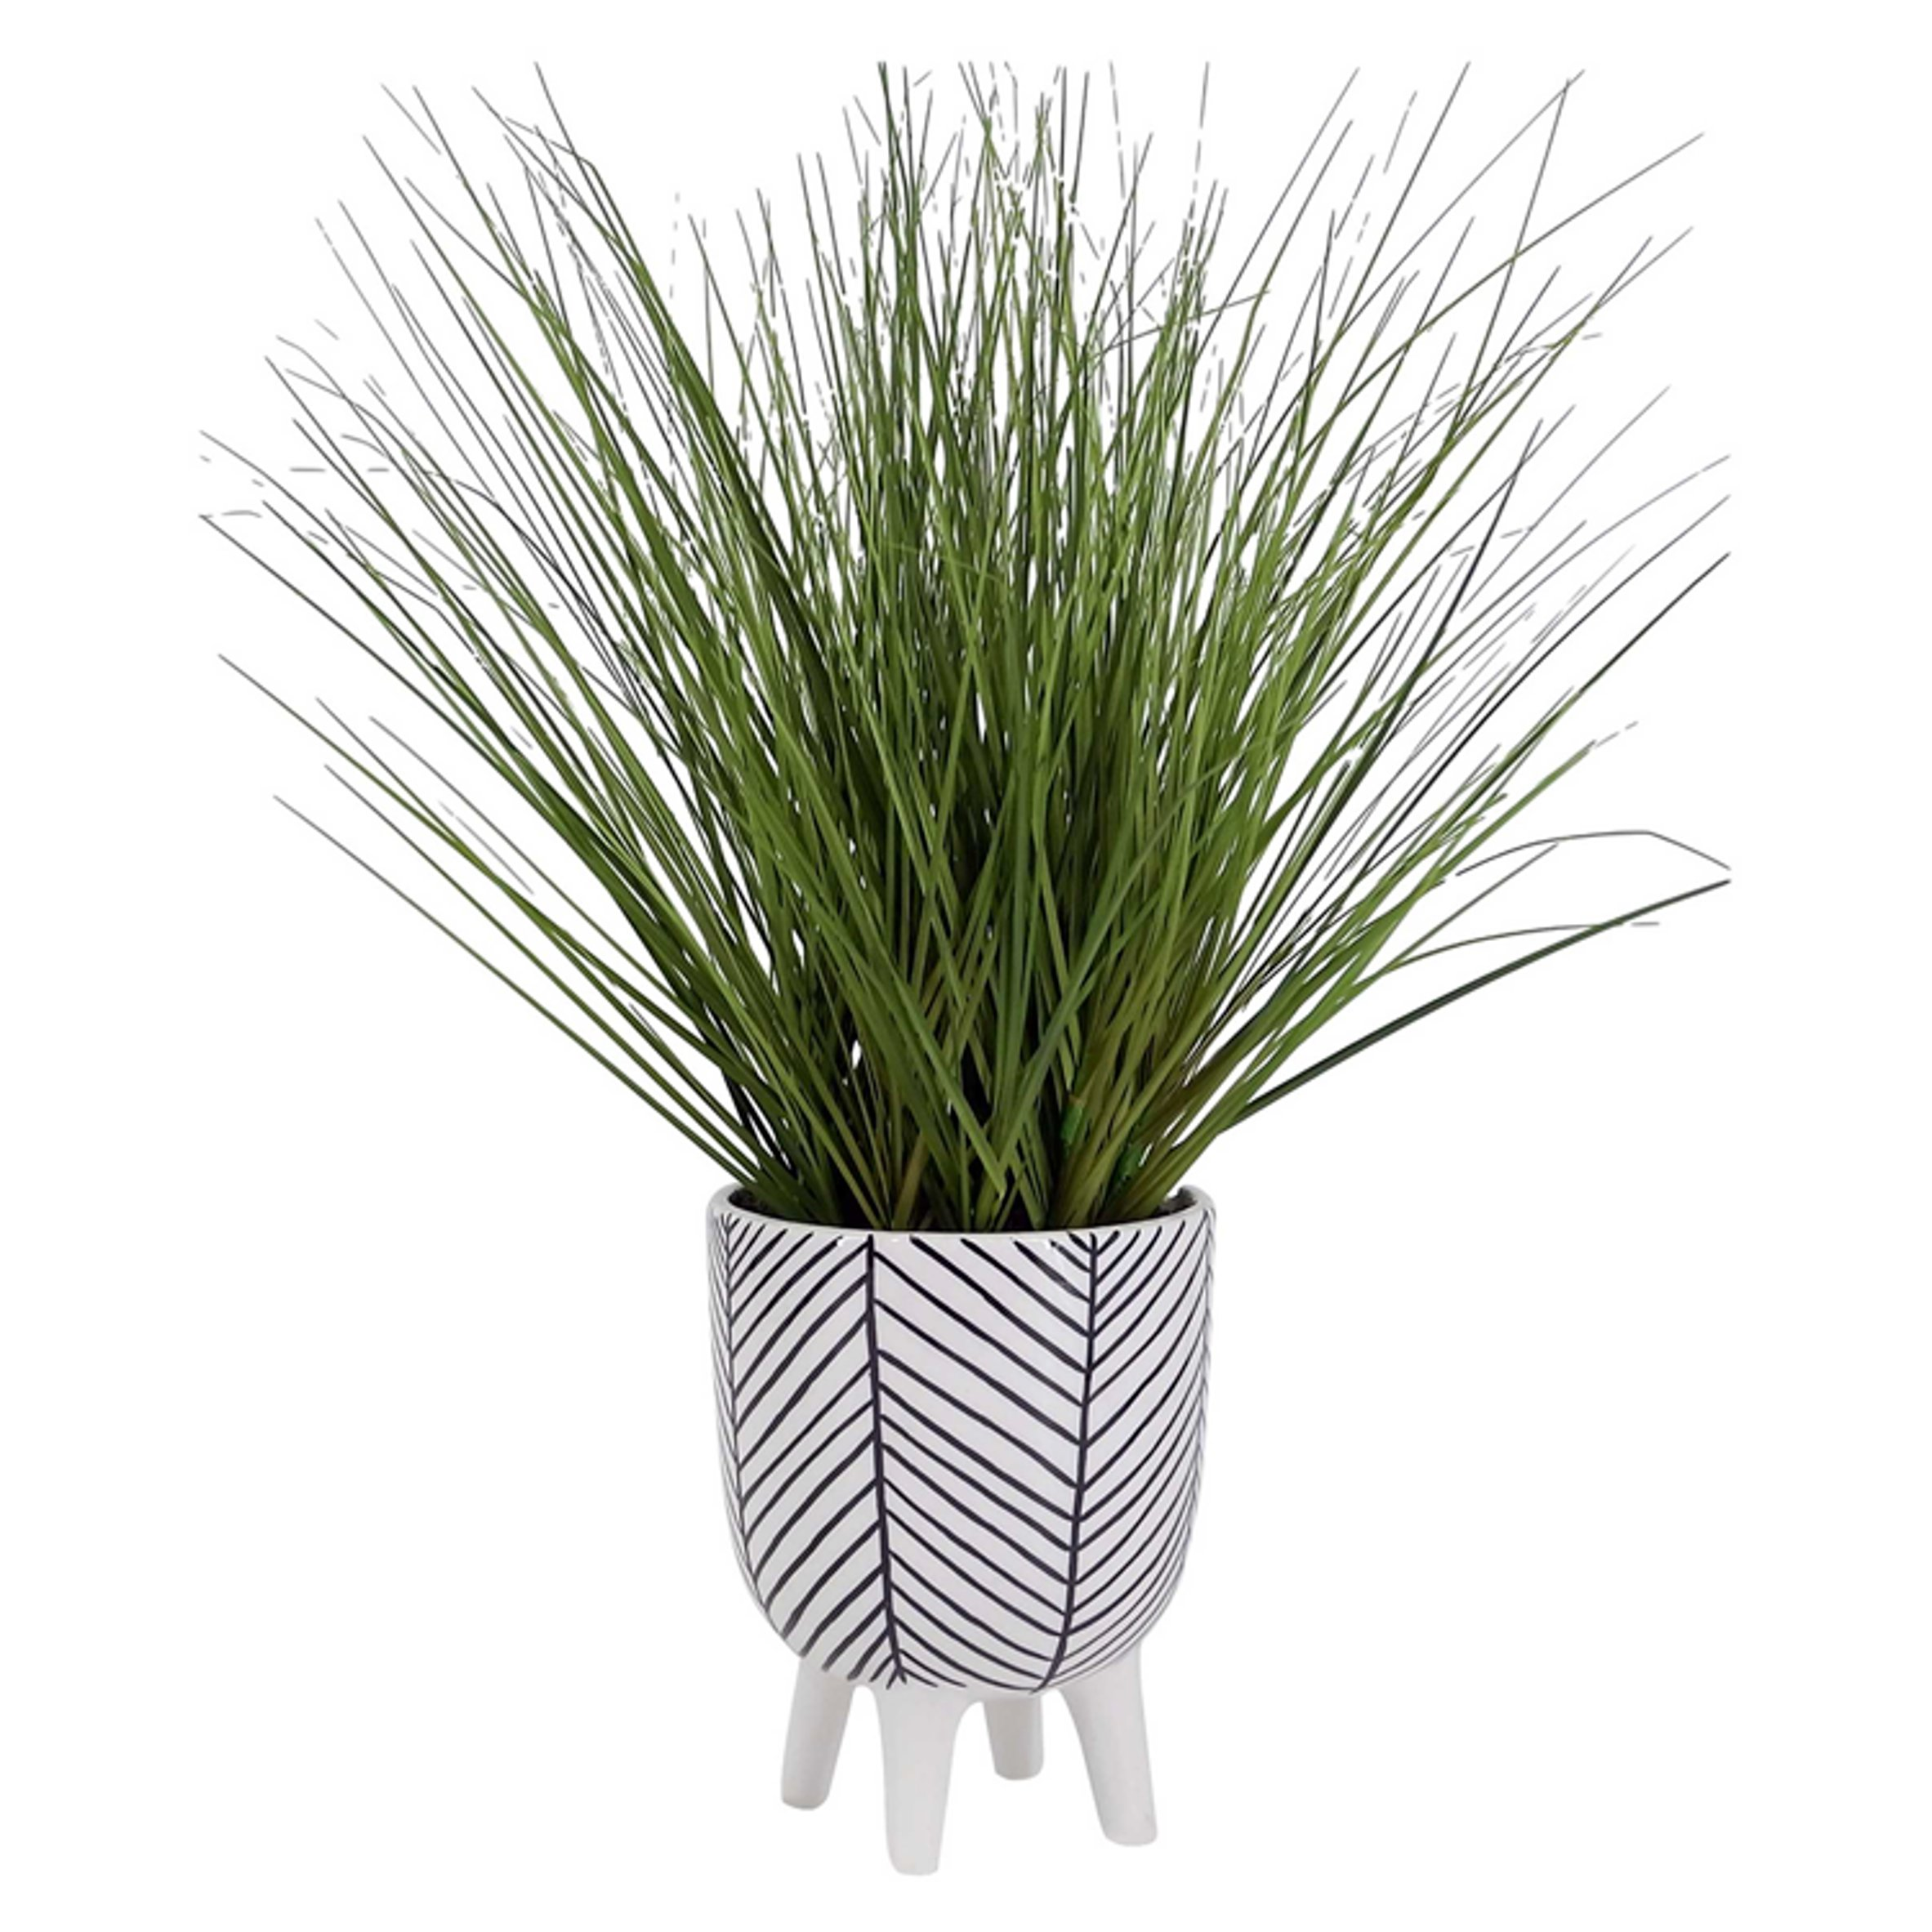 Artifloral Grass In Ceramic Stand